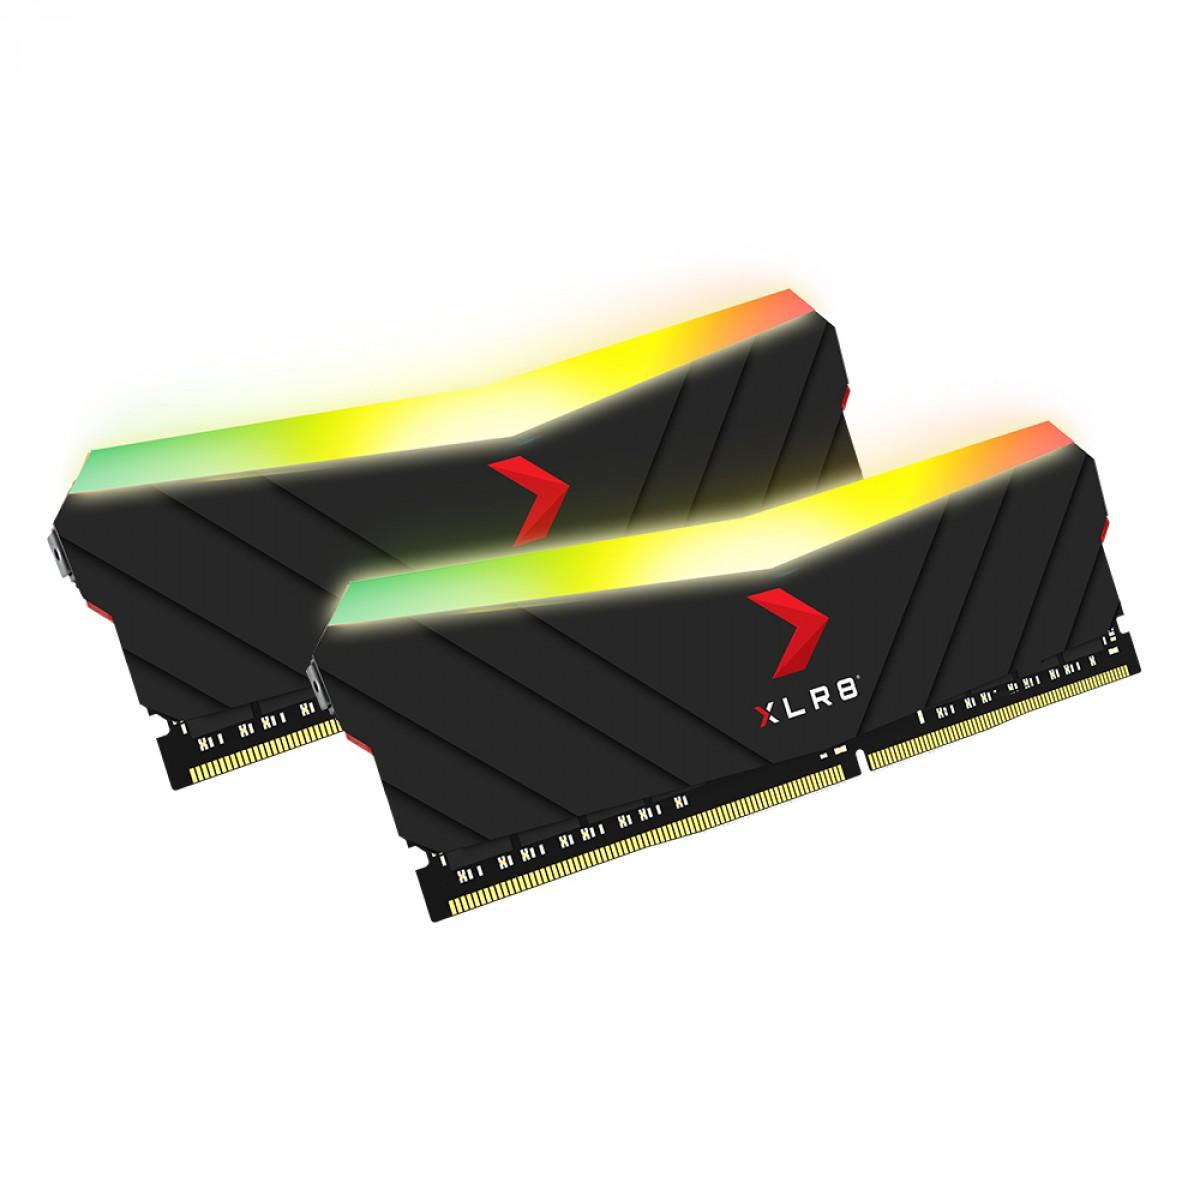 Memória DDR4 PNY XLR8 RGB Gaming, 32GB (2x16GB), 3200MHZ, MD32GK2D4320016XRGB